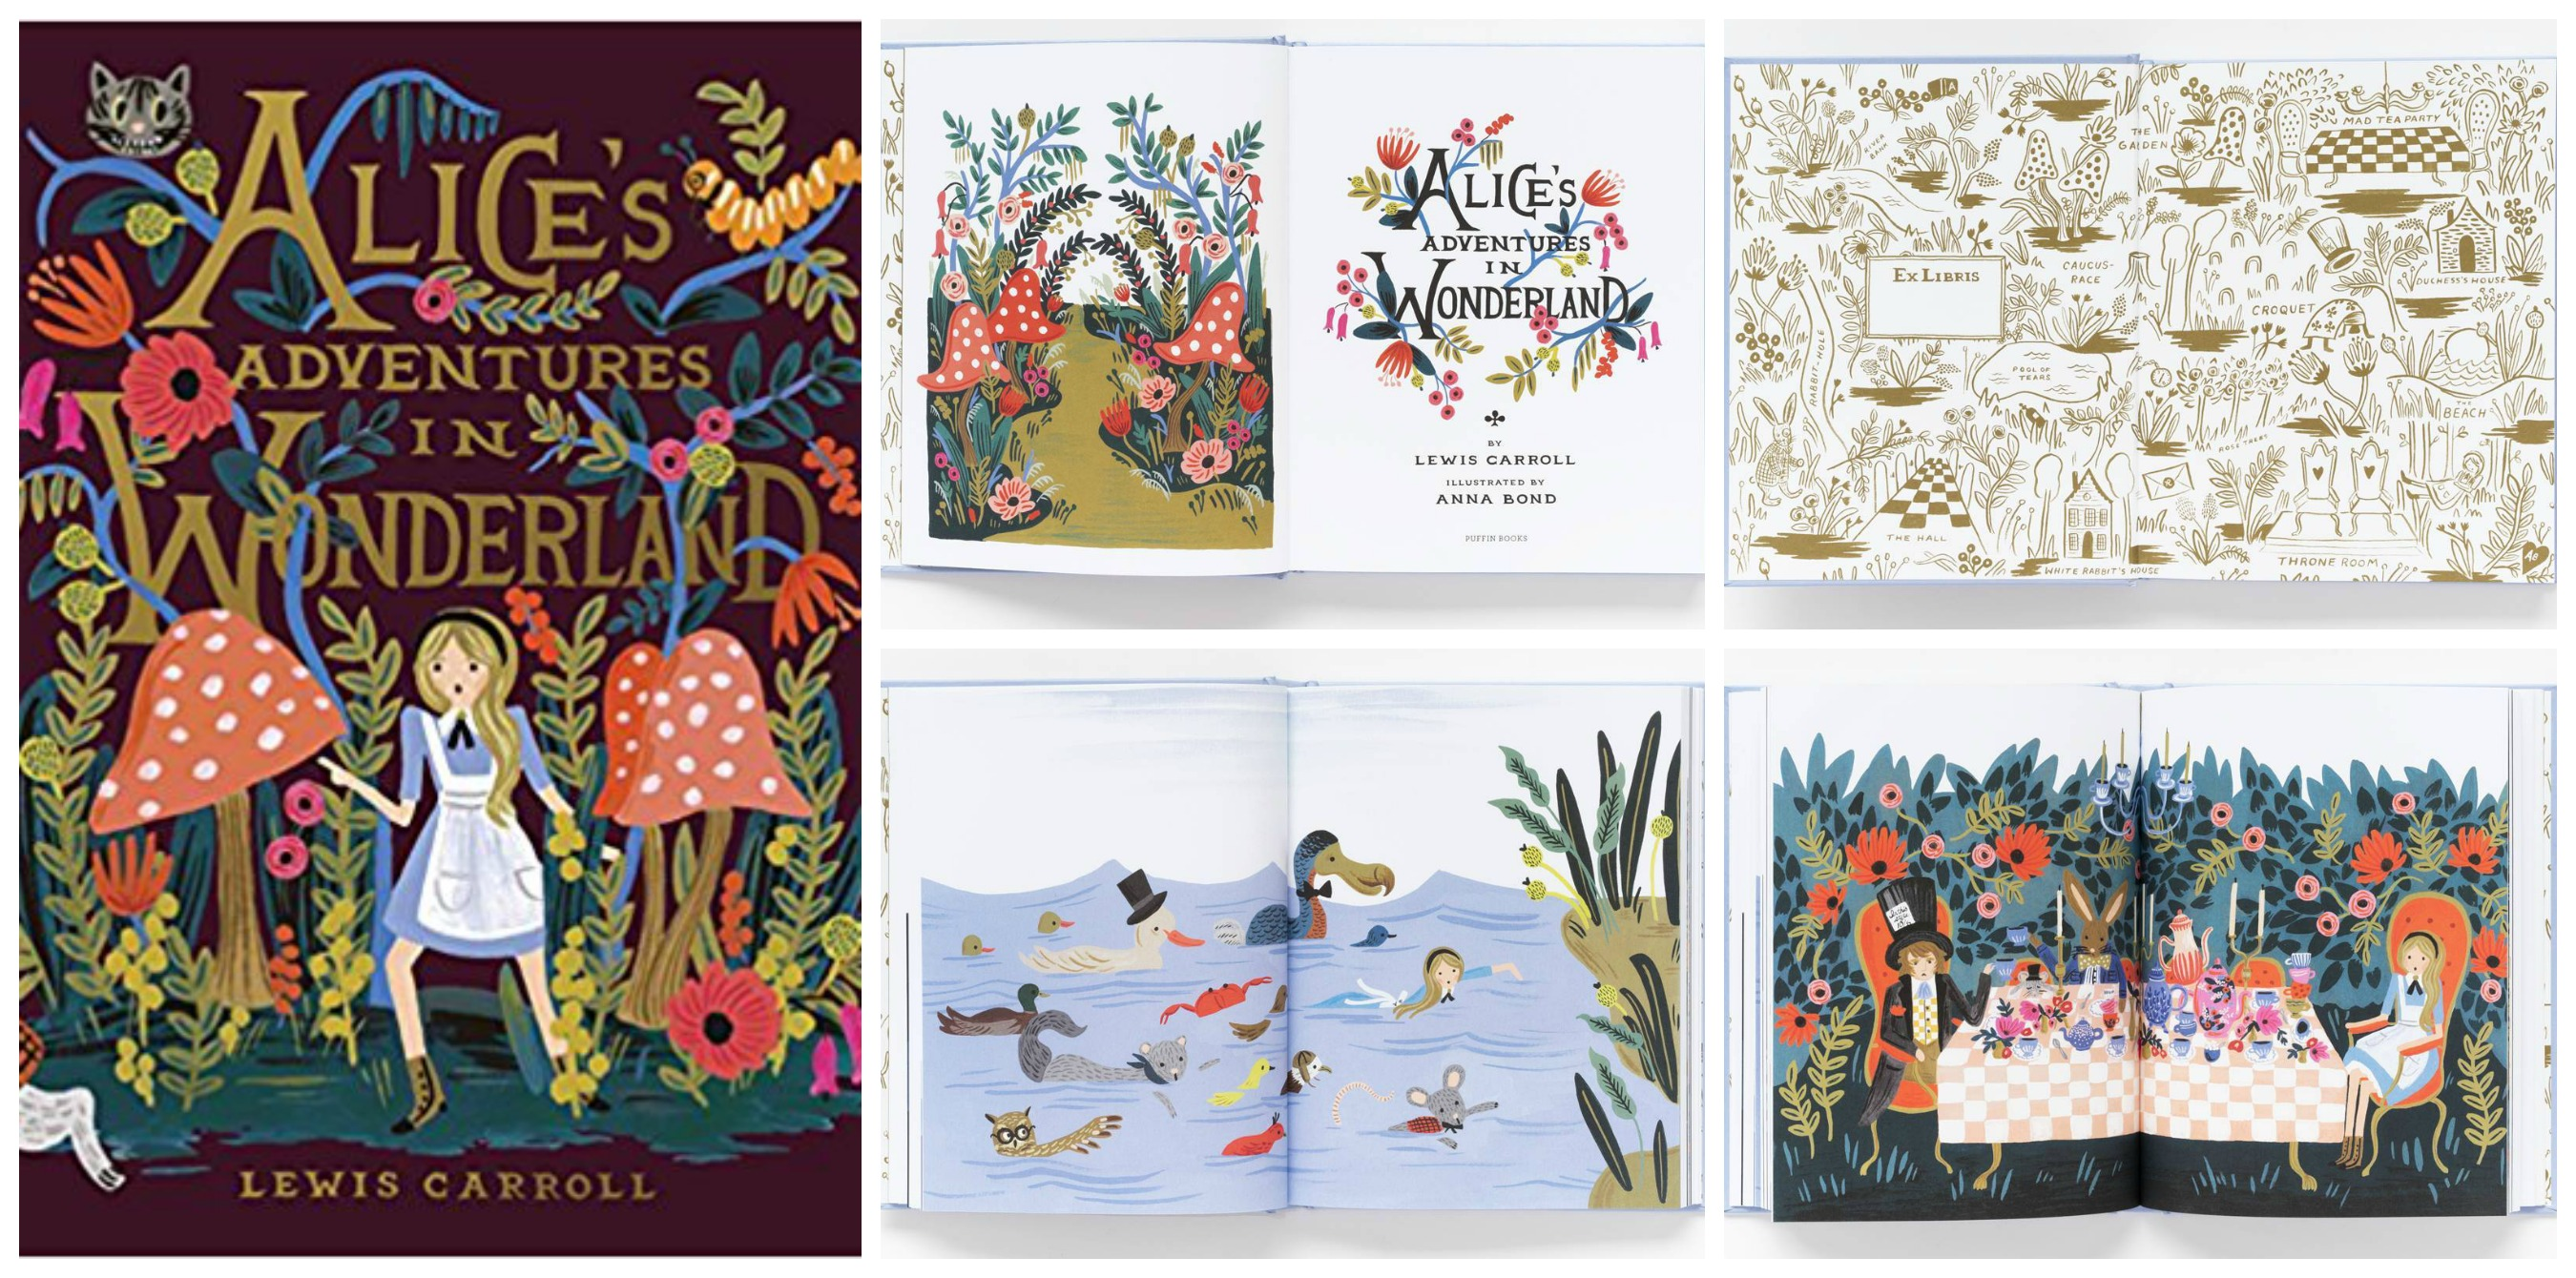 Alice's Adventures in Wonderland illustrated by Anna Bond